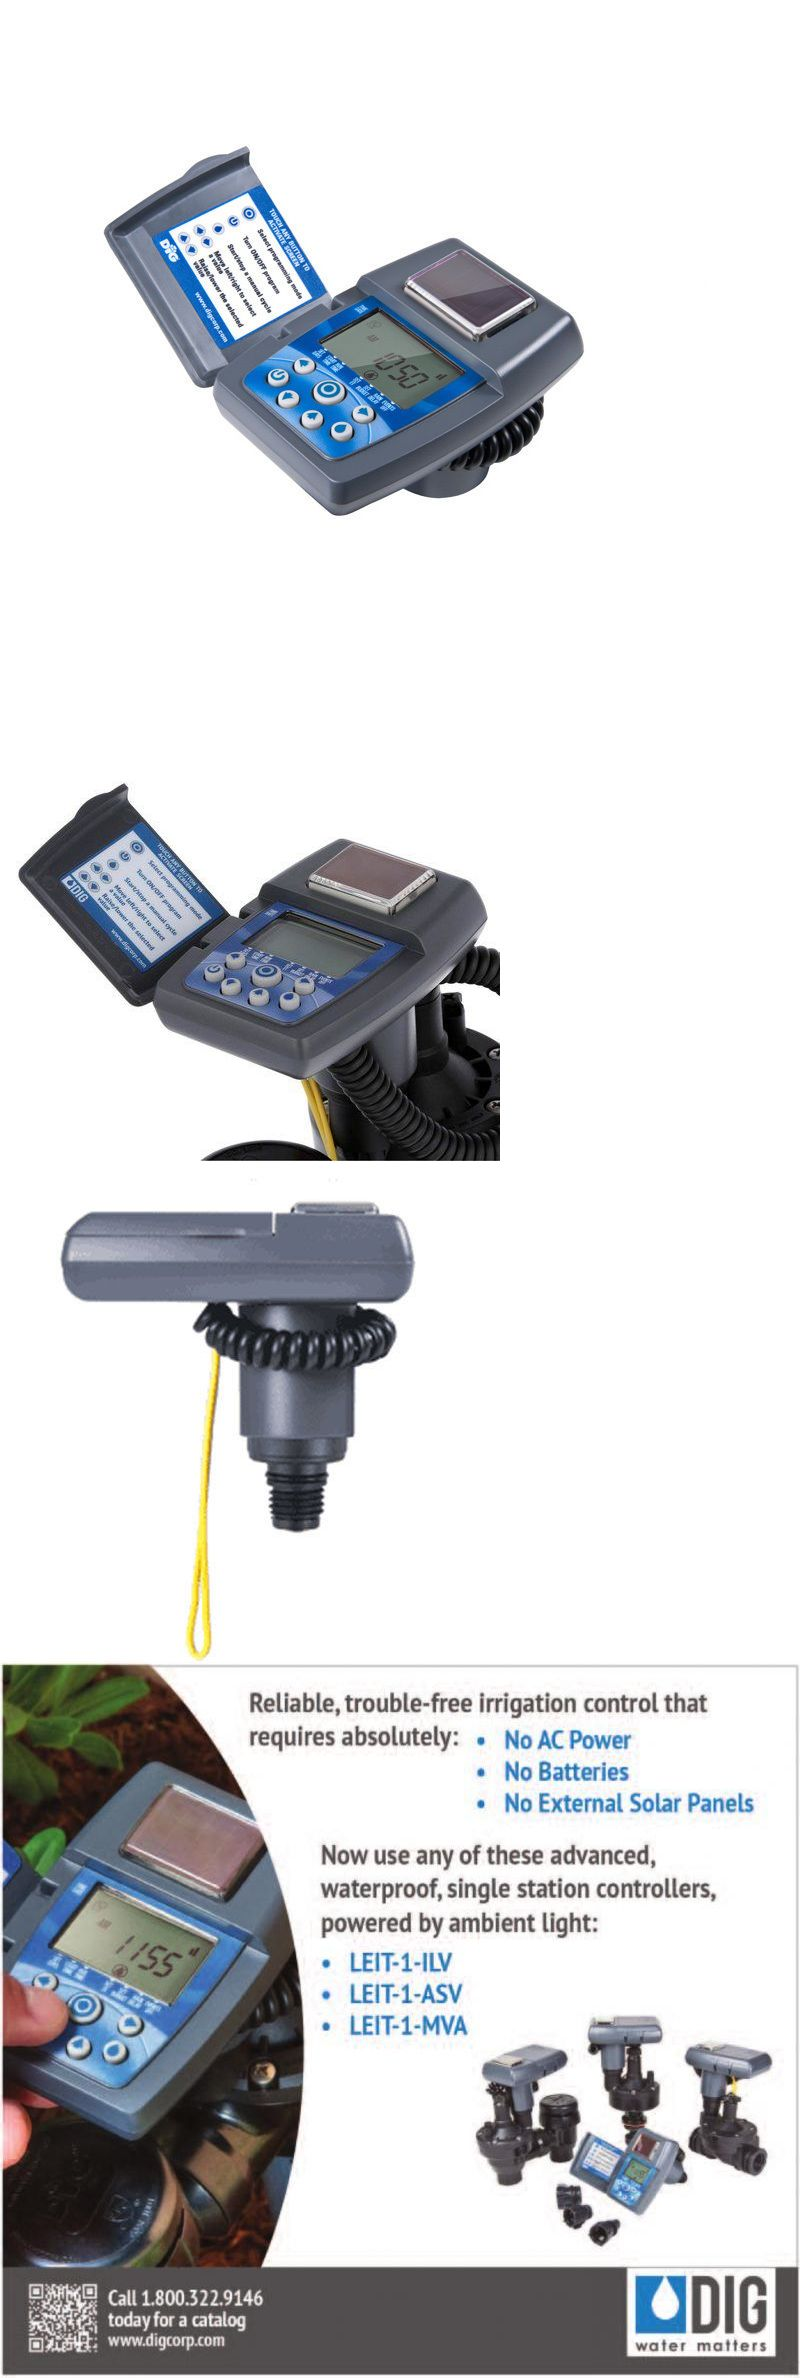 Dig Leit 1 Single Station Solar Irrigation Controller Includes Adapters Irrigation Controller Drip Irrigation Irrigation